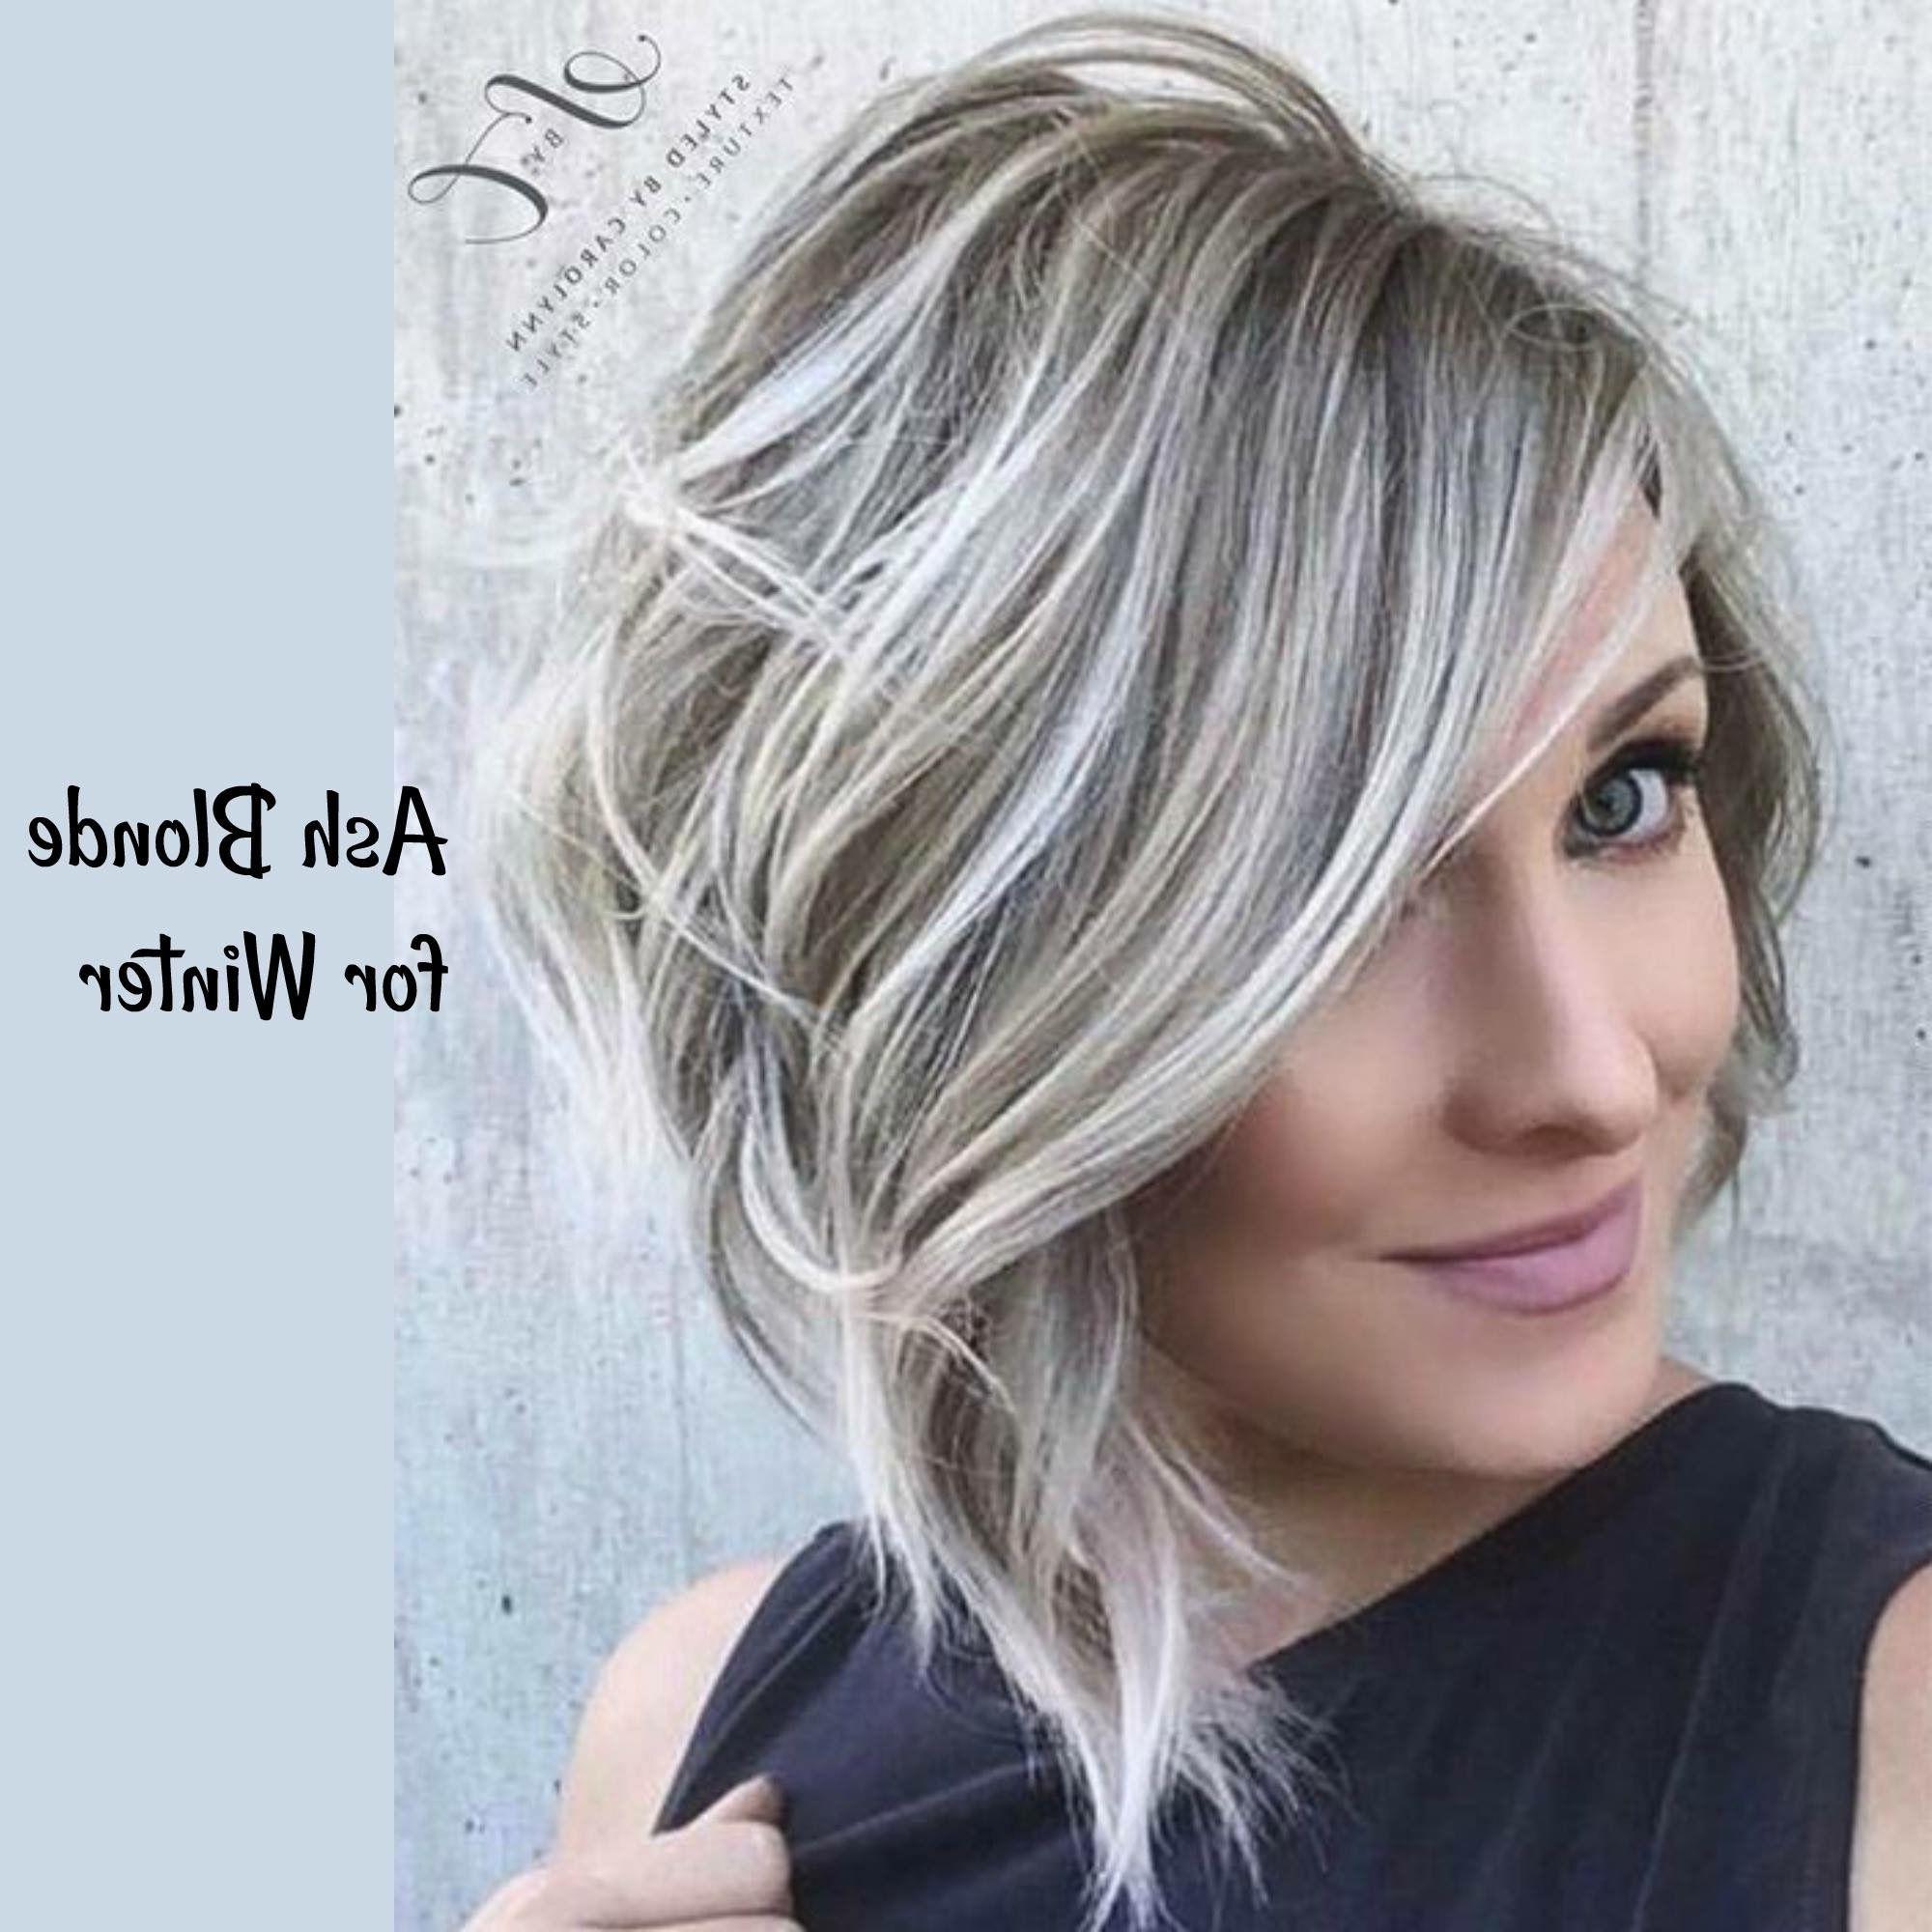 Pinsuzette Grijalva On My New Hair | Pinterest | Hair, Hair Inside Ash Blonde Short Hairstyles (View 15 of 25)